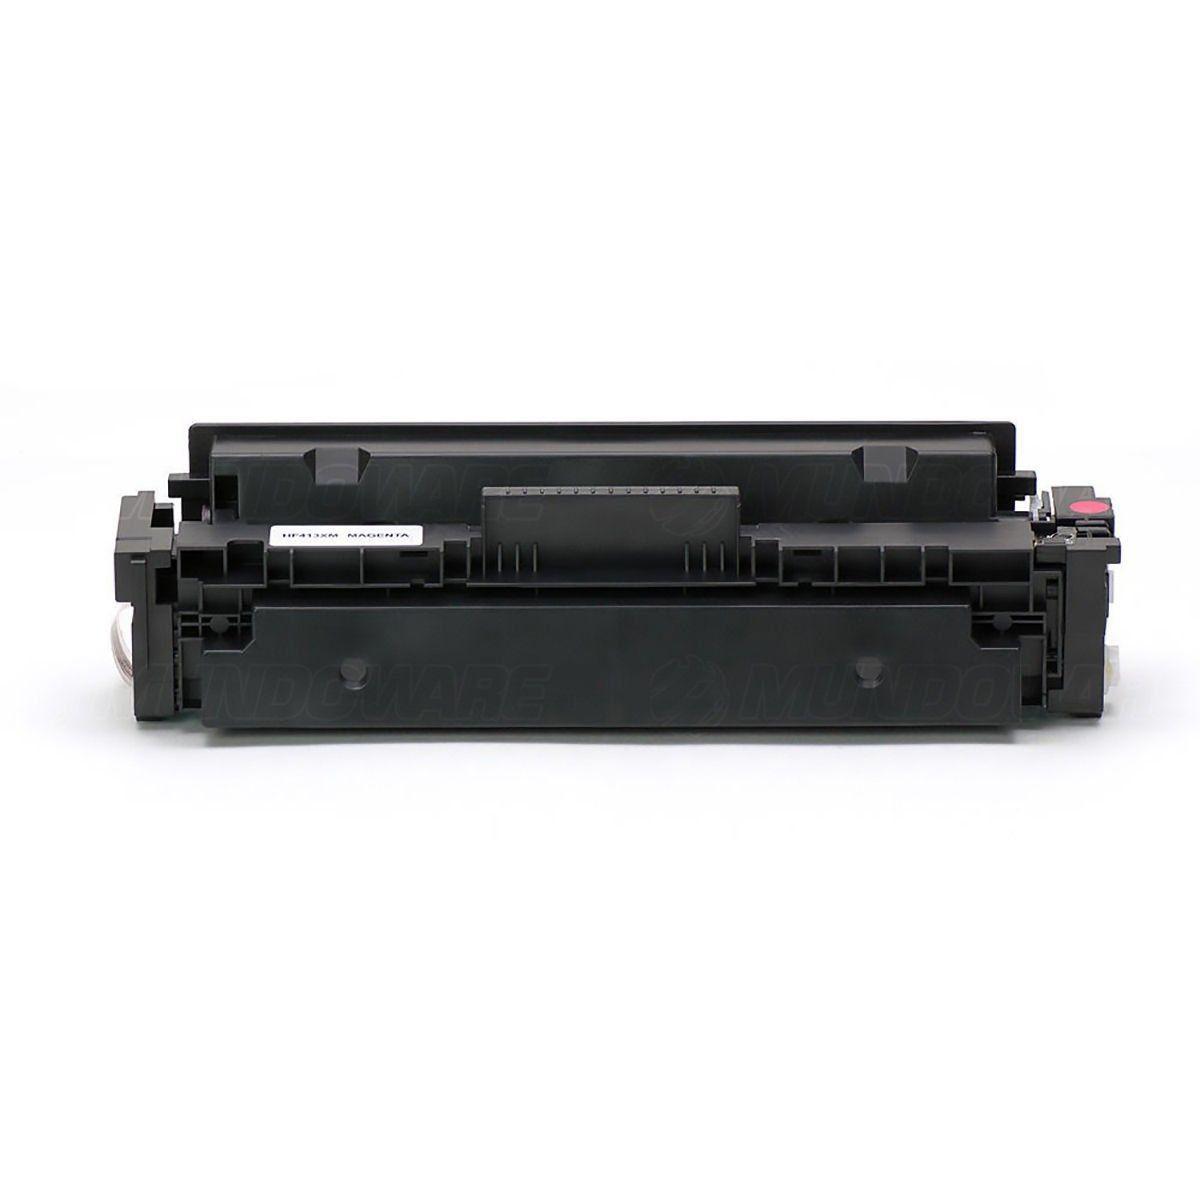 Compatível: Toner CF413X 413X para Impressora HP M477 M452 M477fdn M452dw M477fnw M452nw / Magenta / 5.000